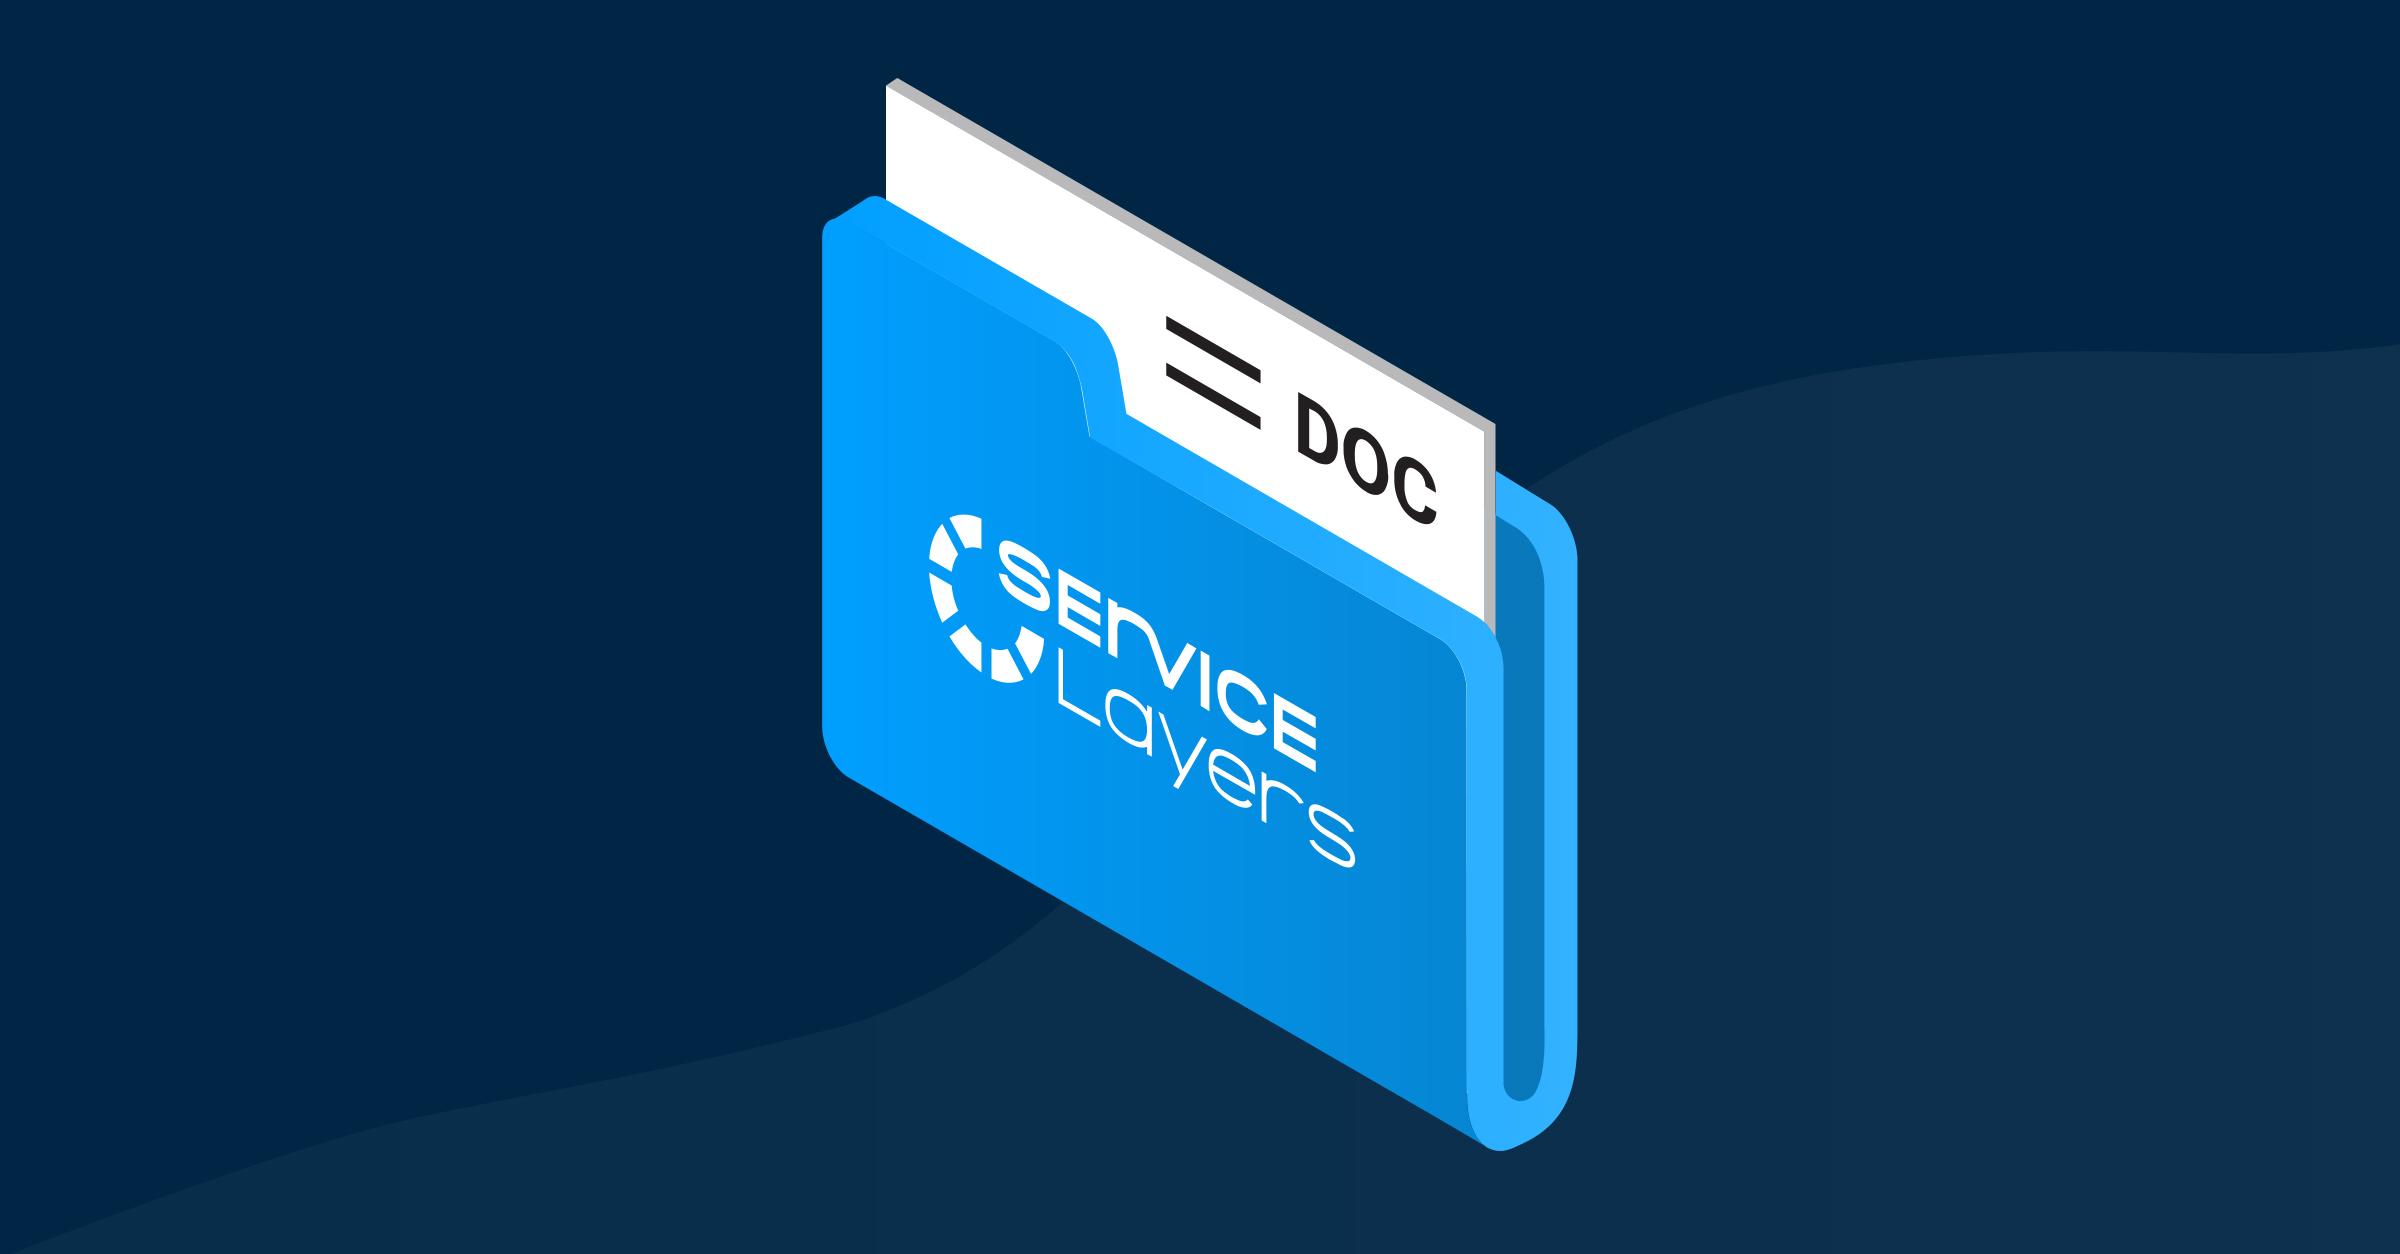 service-layers-case-study-1200x627